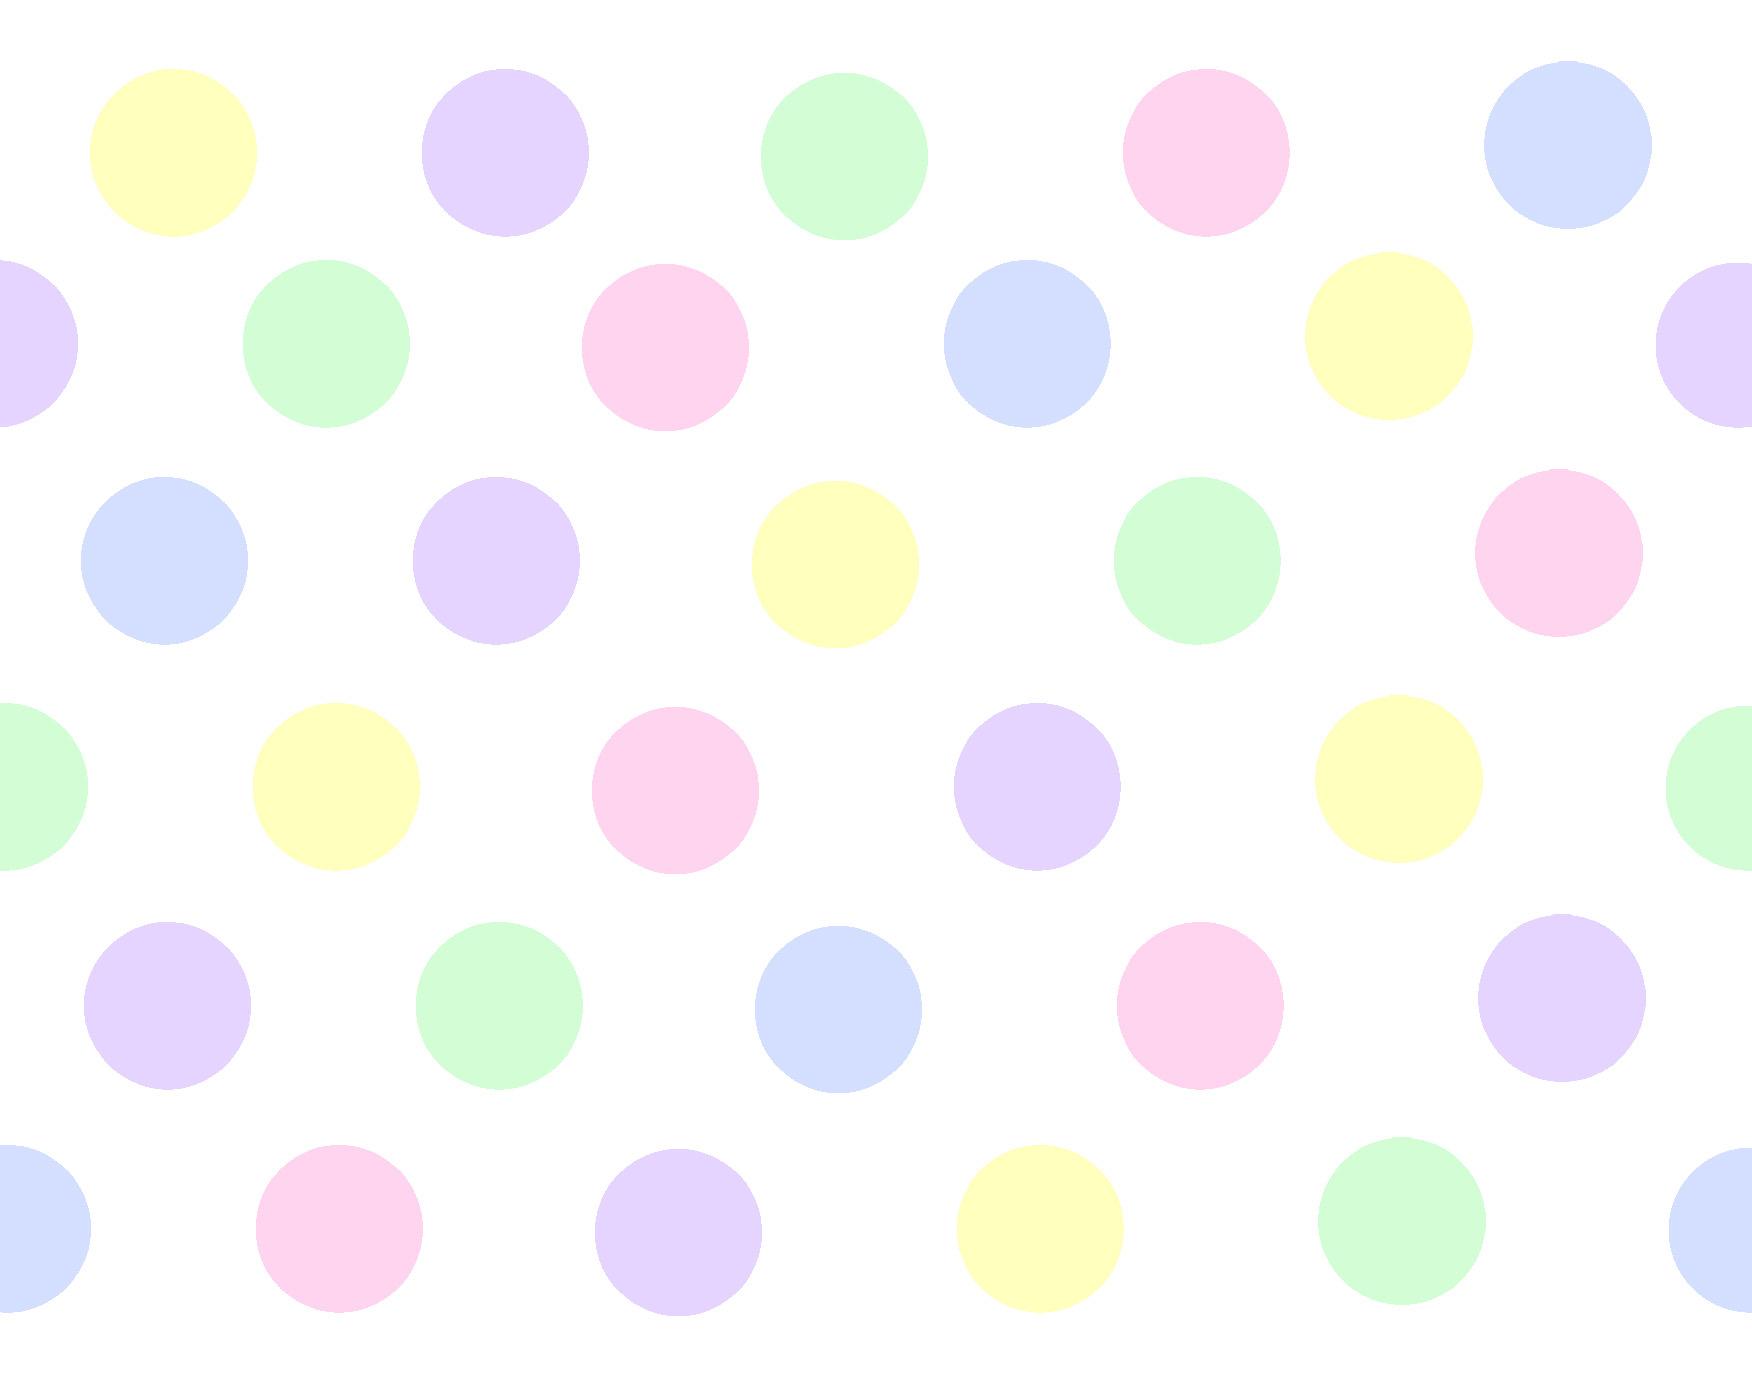 Polka dot wallpapers wallpapersafari for Polka dot wallpaper